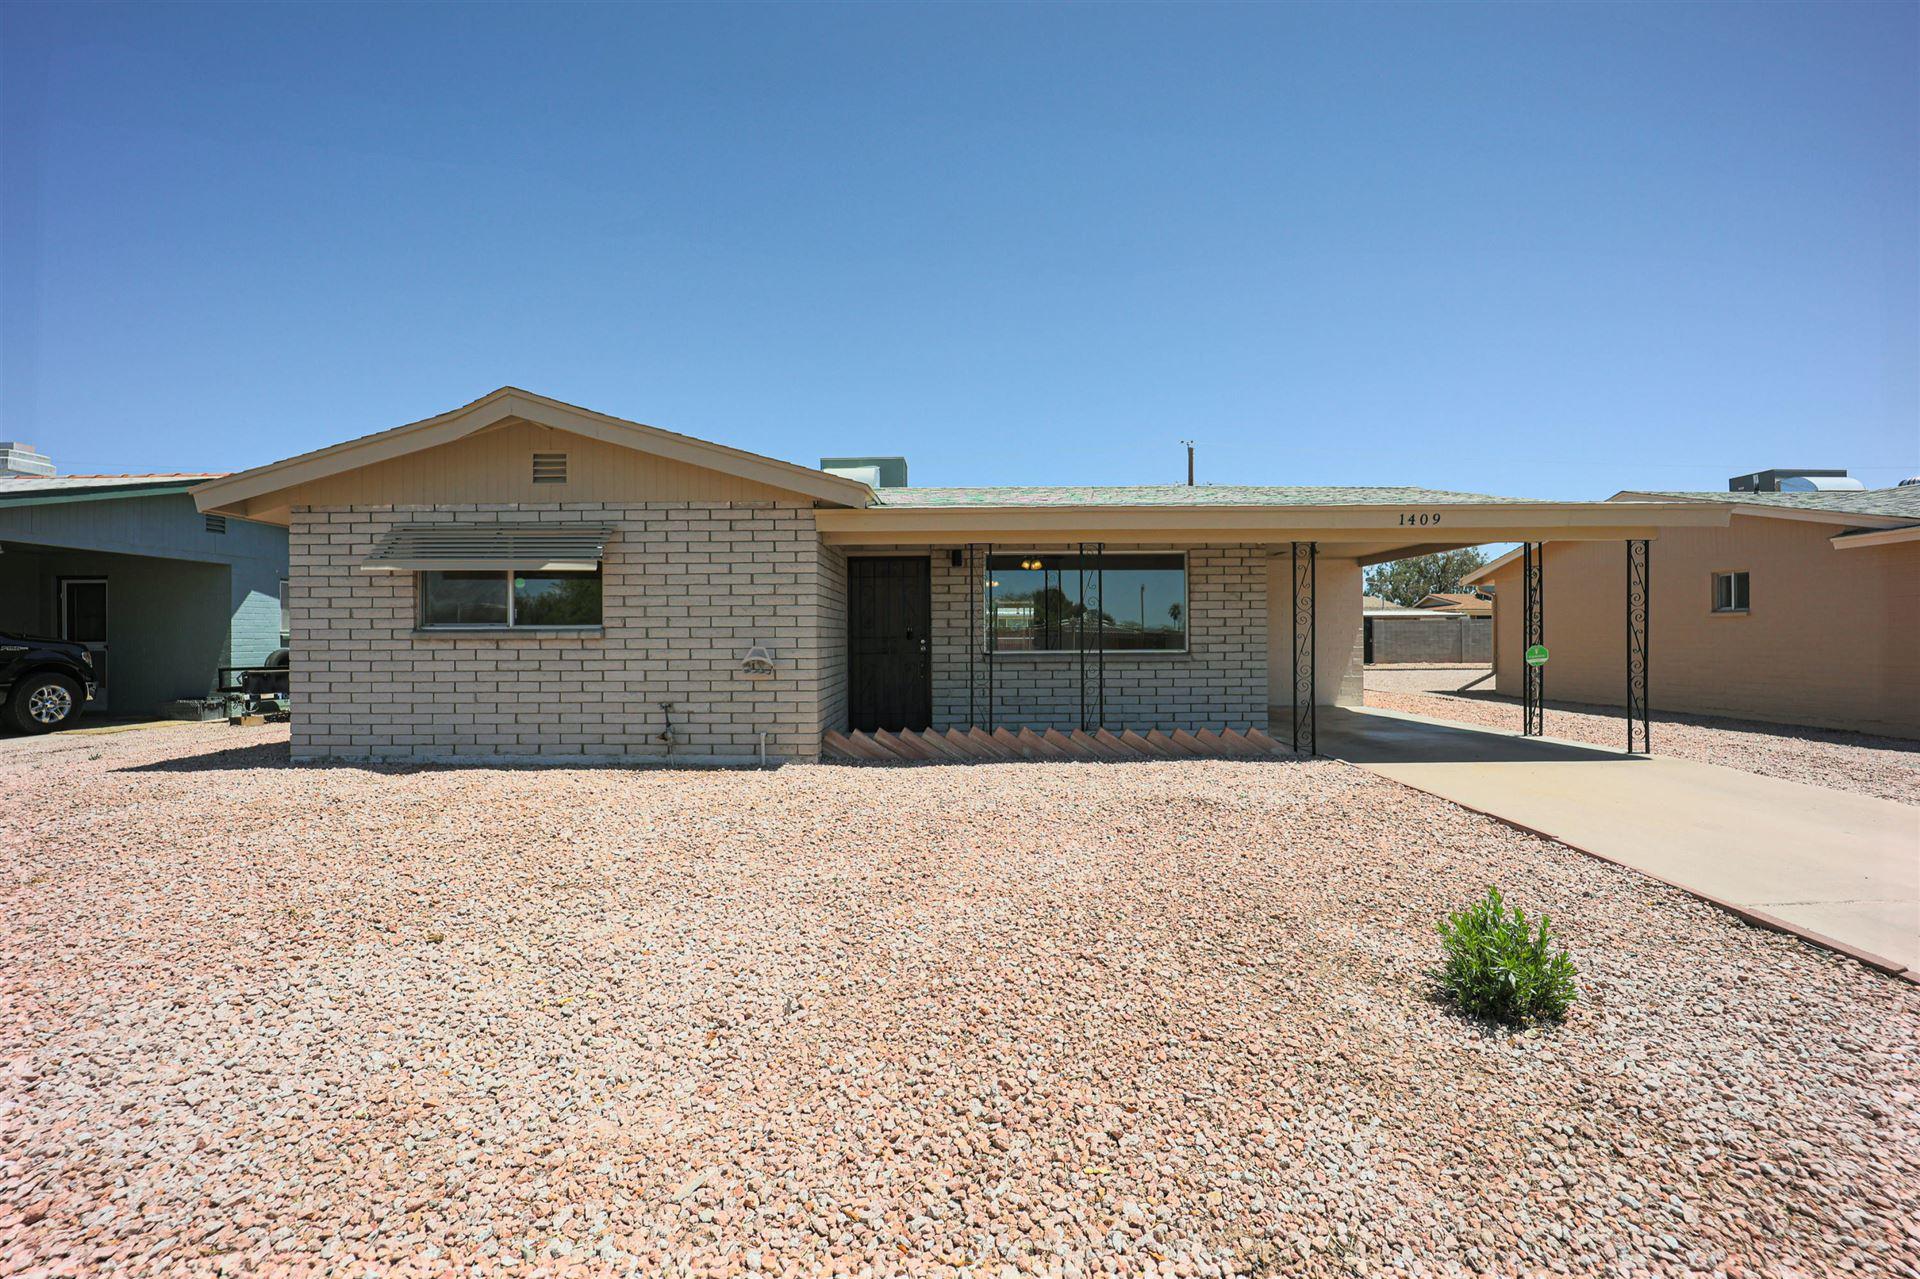 Photo of 1409 S DELAWARE Drive, Apache Junction, AZ 85120 (MLS # 6231899)